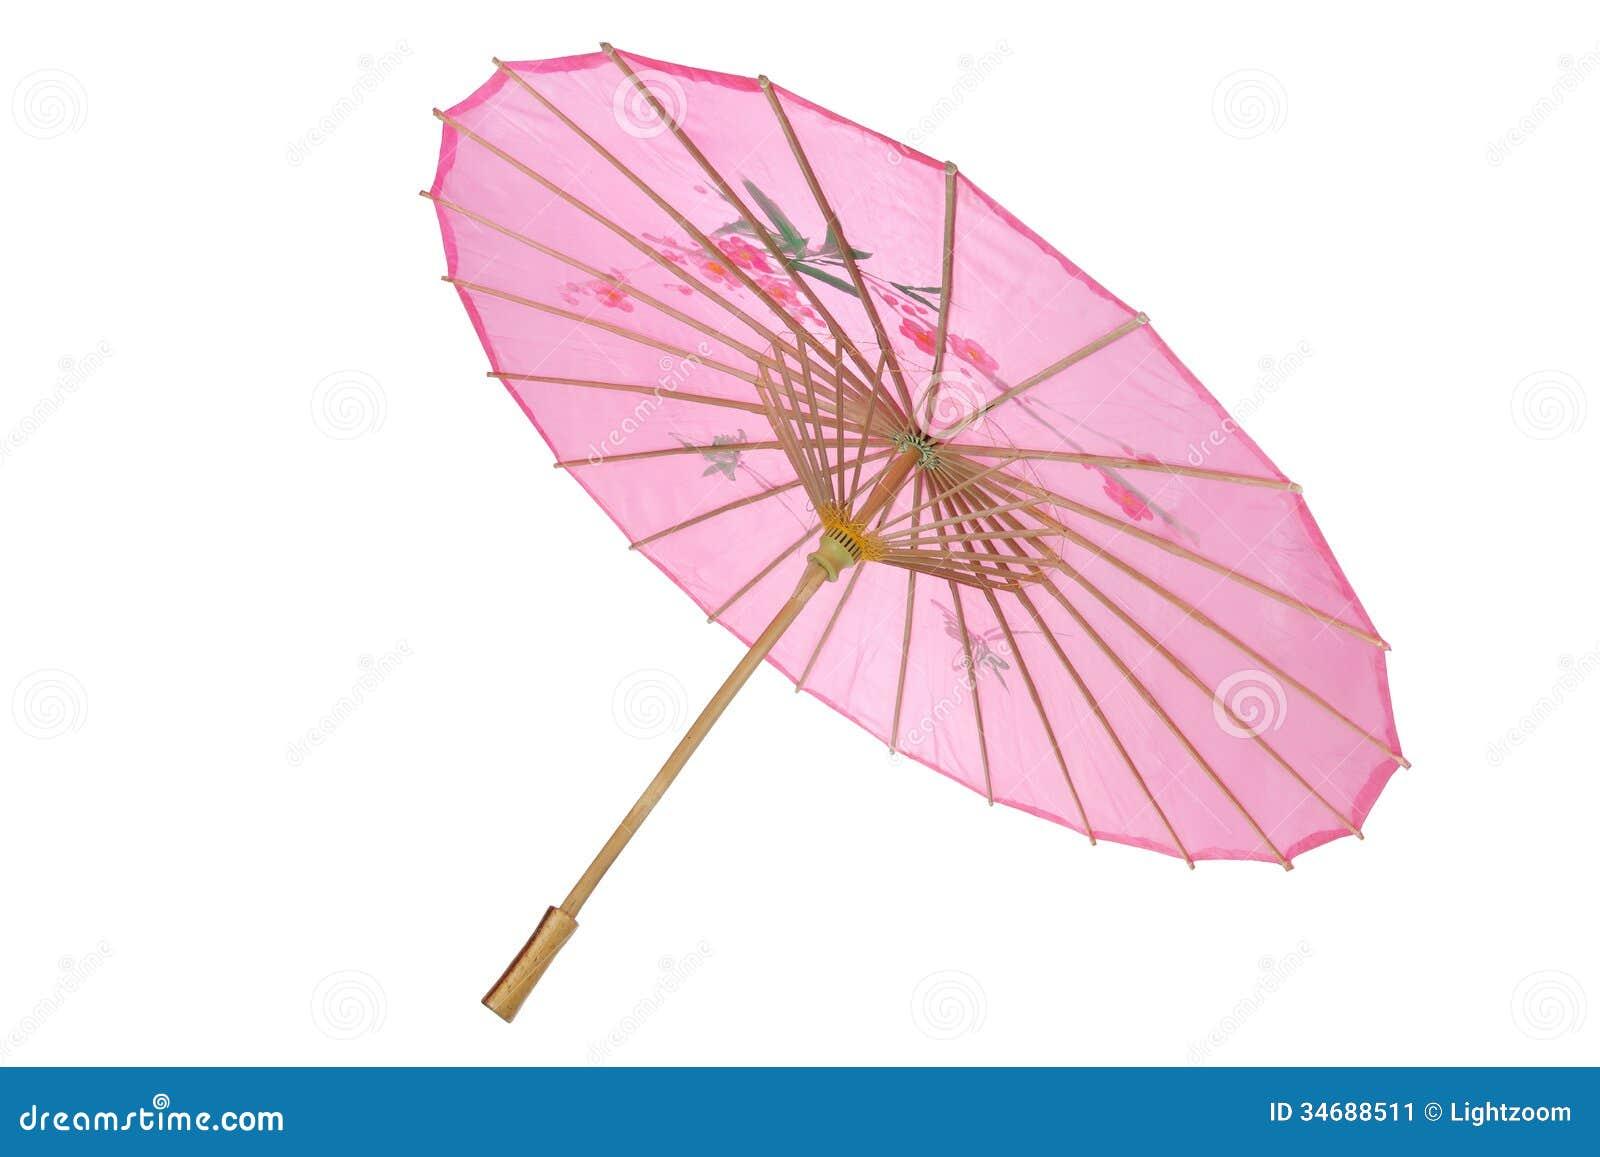 Paper Umbrella Stock Image - Image: 34688511